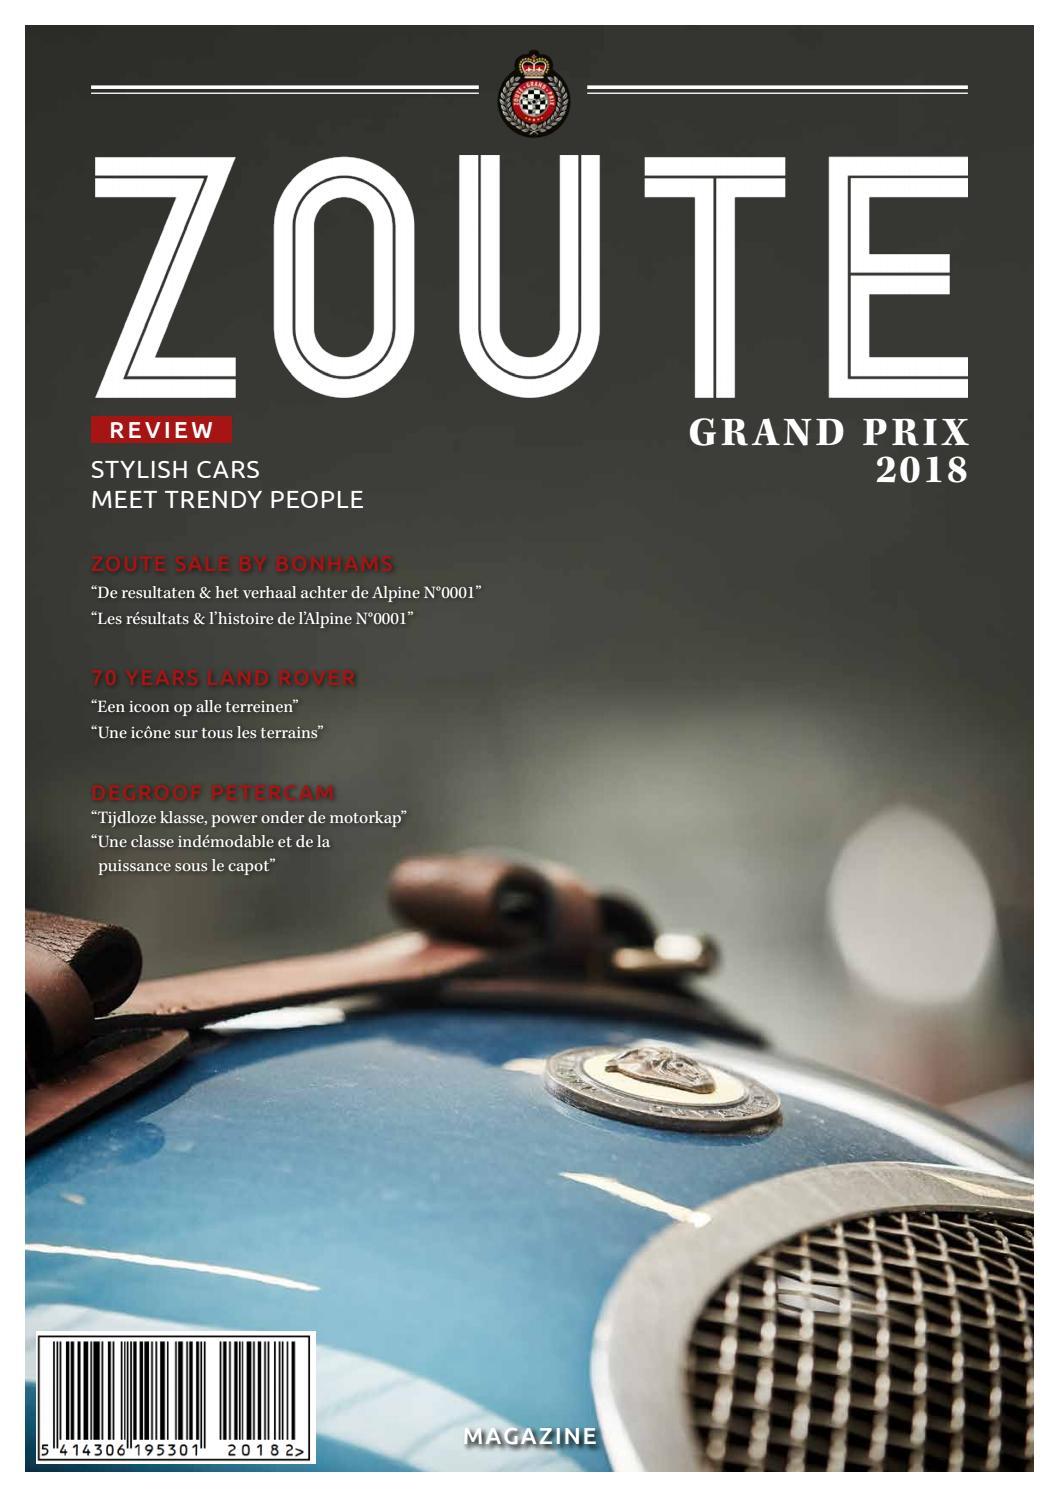 d36390ec641afe ZGP REVIEW 2018 by D M S - issuu